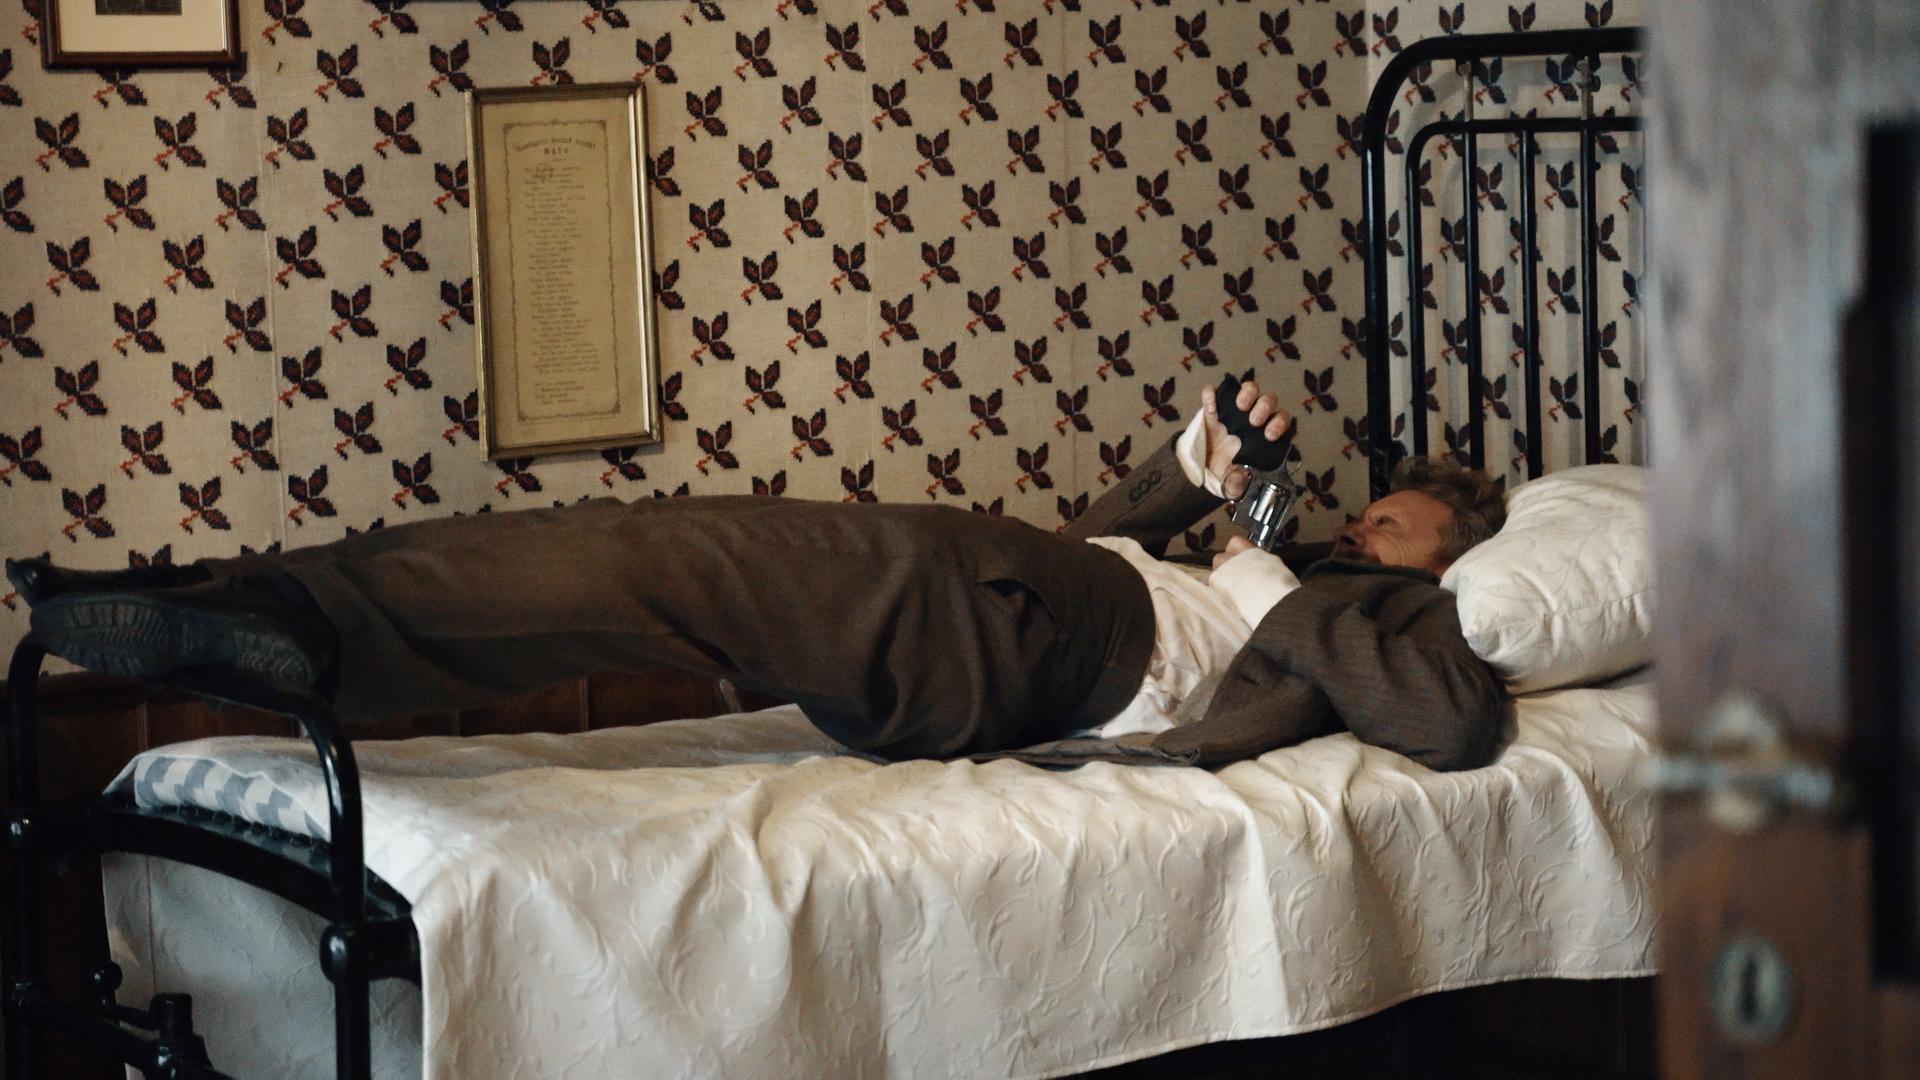 Aktorius ant lovos.